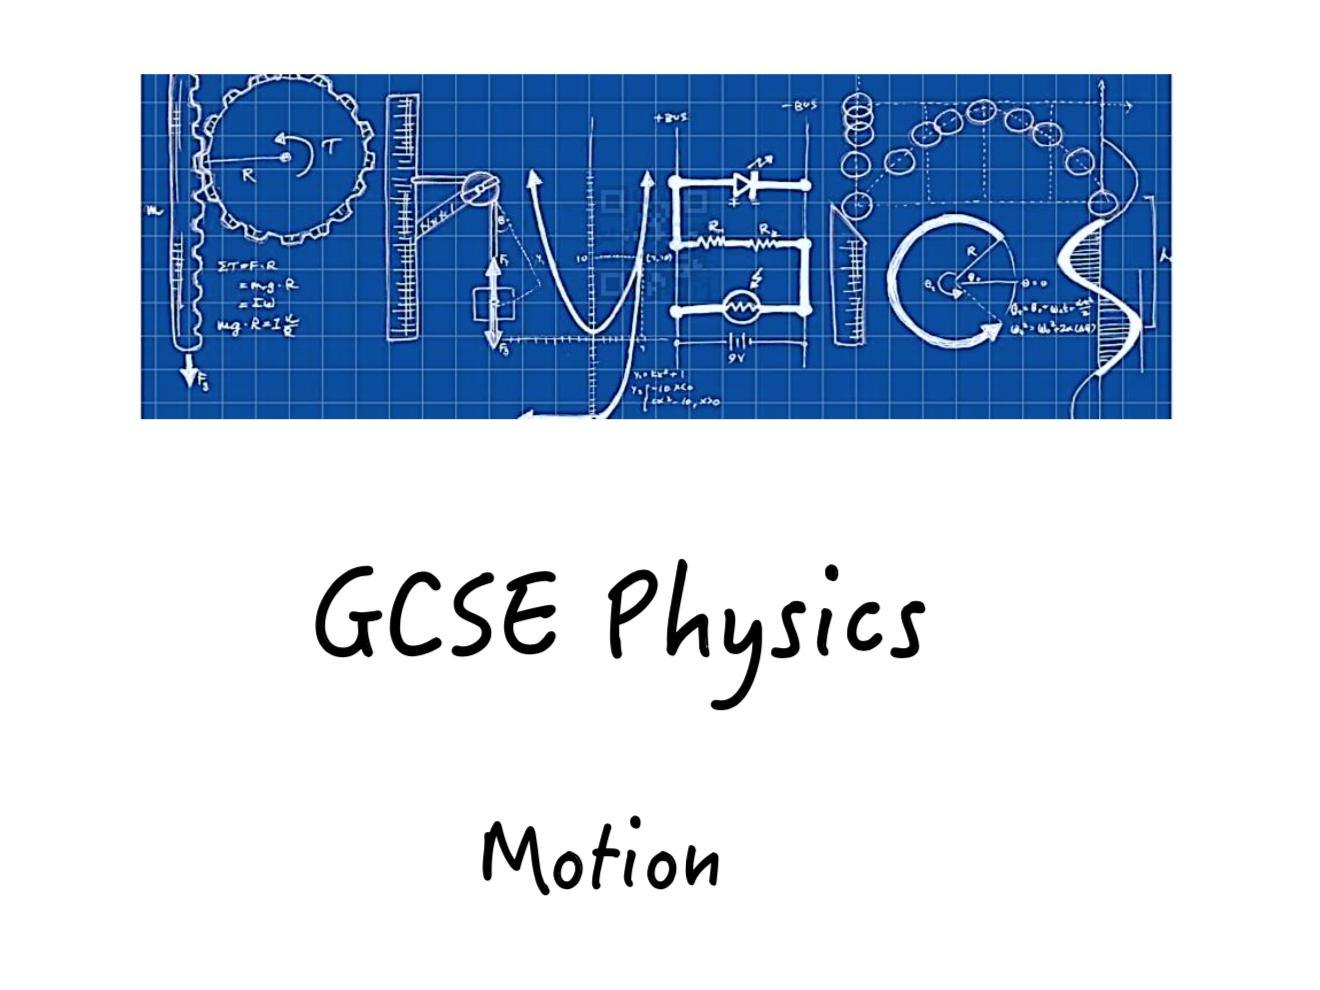 GCSE Motion Topic